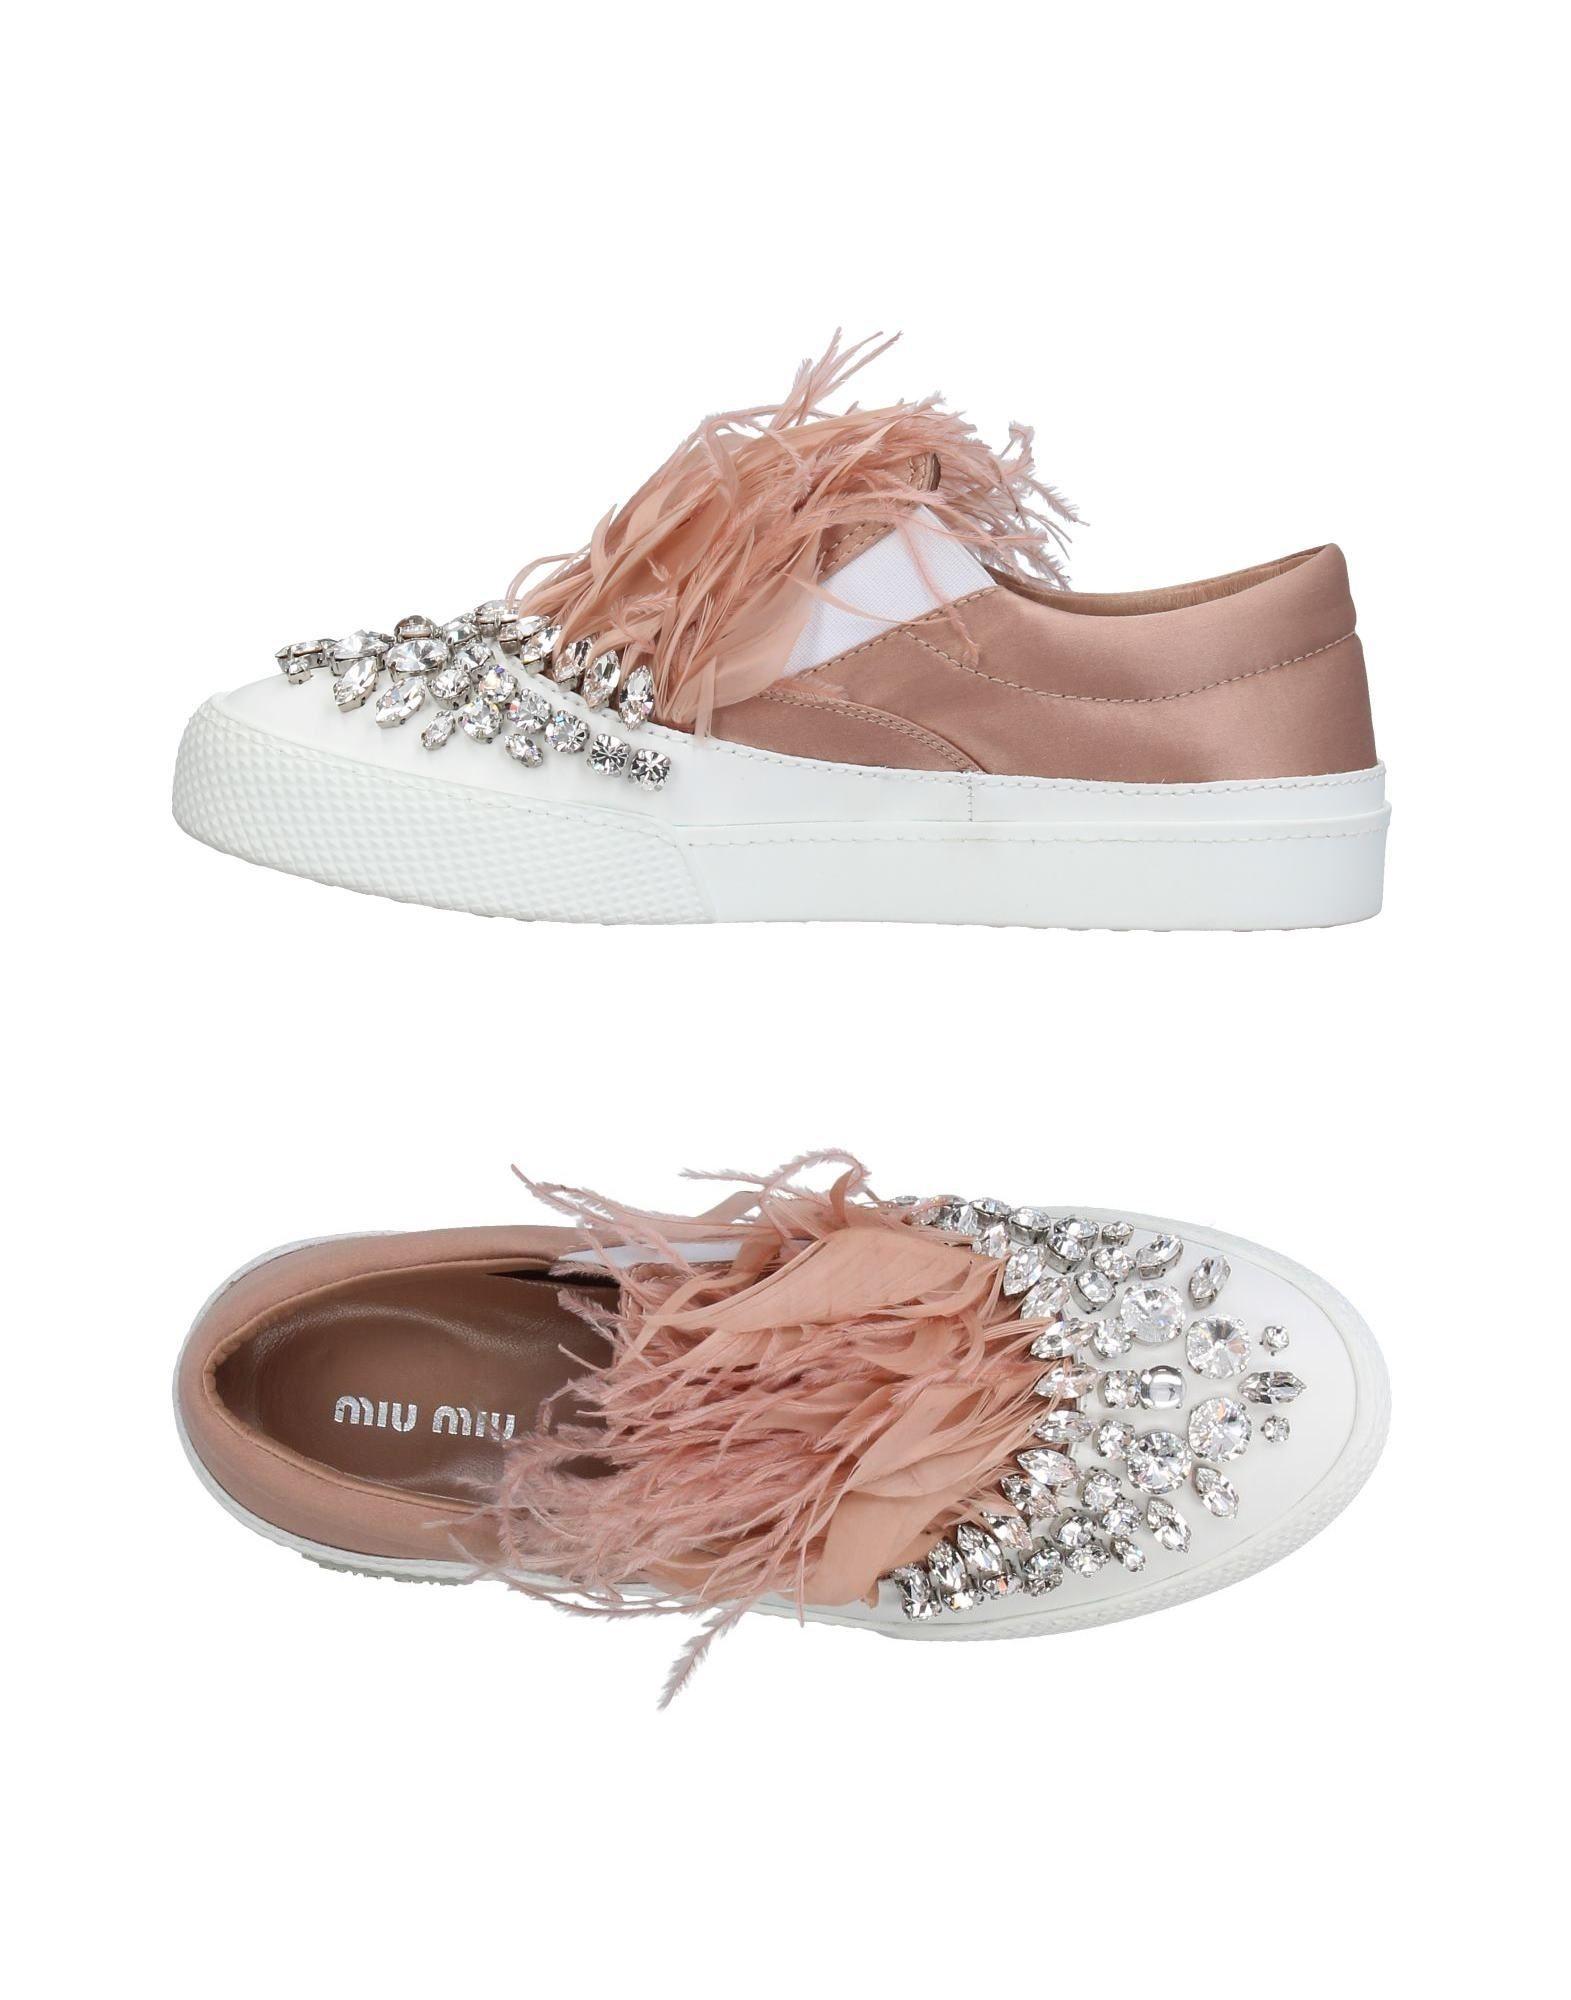 cdf6d71e52b7 MIU MIU Crystal Embellished Satin Slip-On Sneakers